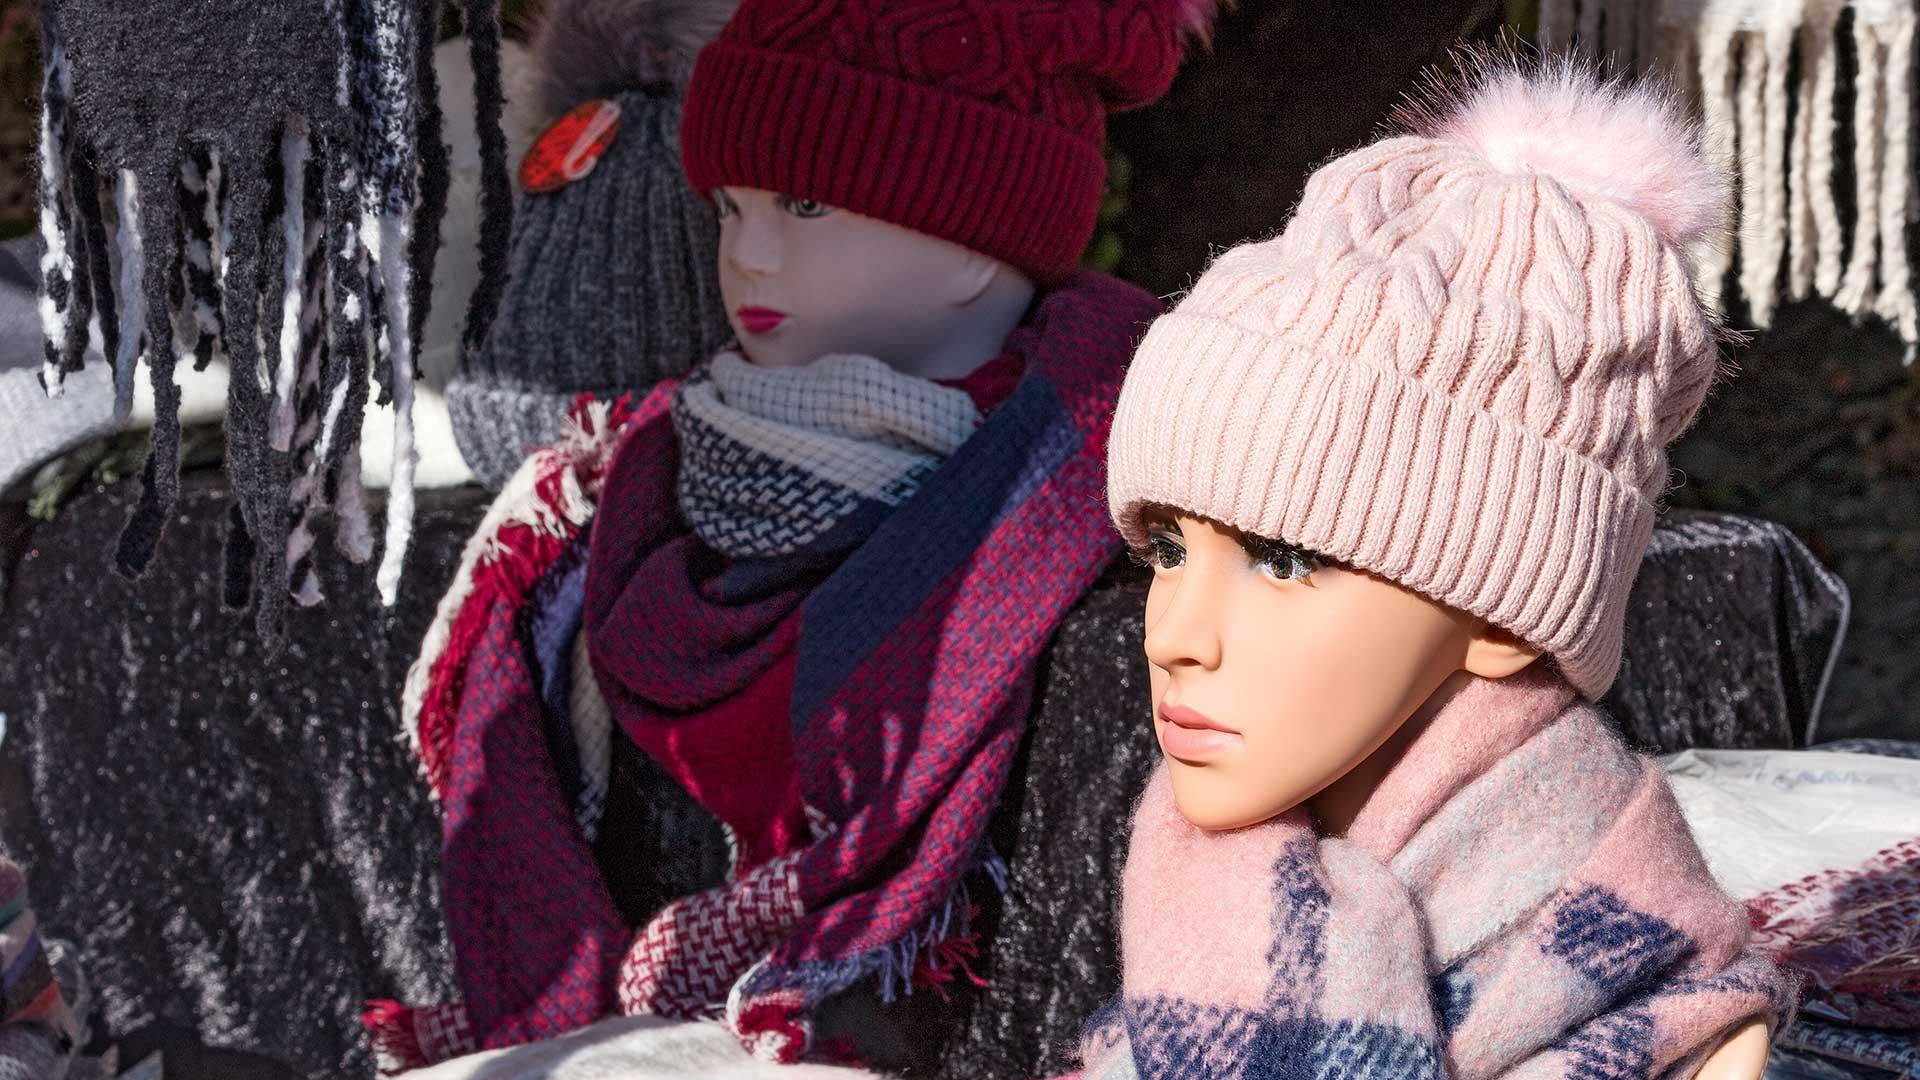 Regionalporträt: Bretagne Märkte – Puppen | Foto: Dieter Eikenberg, imprints